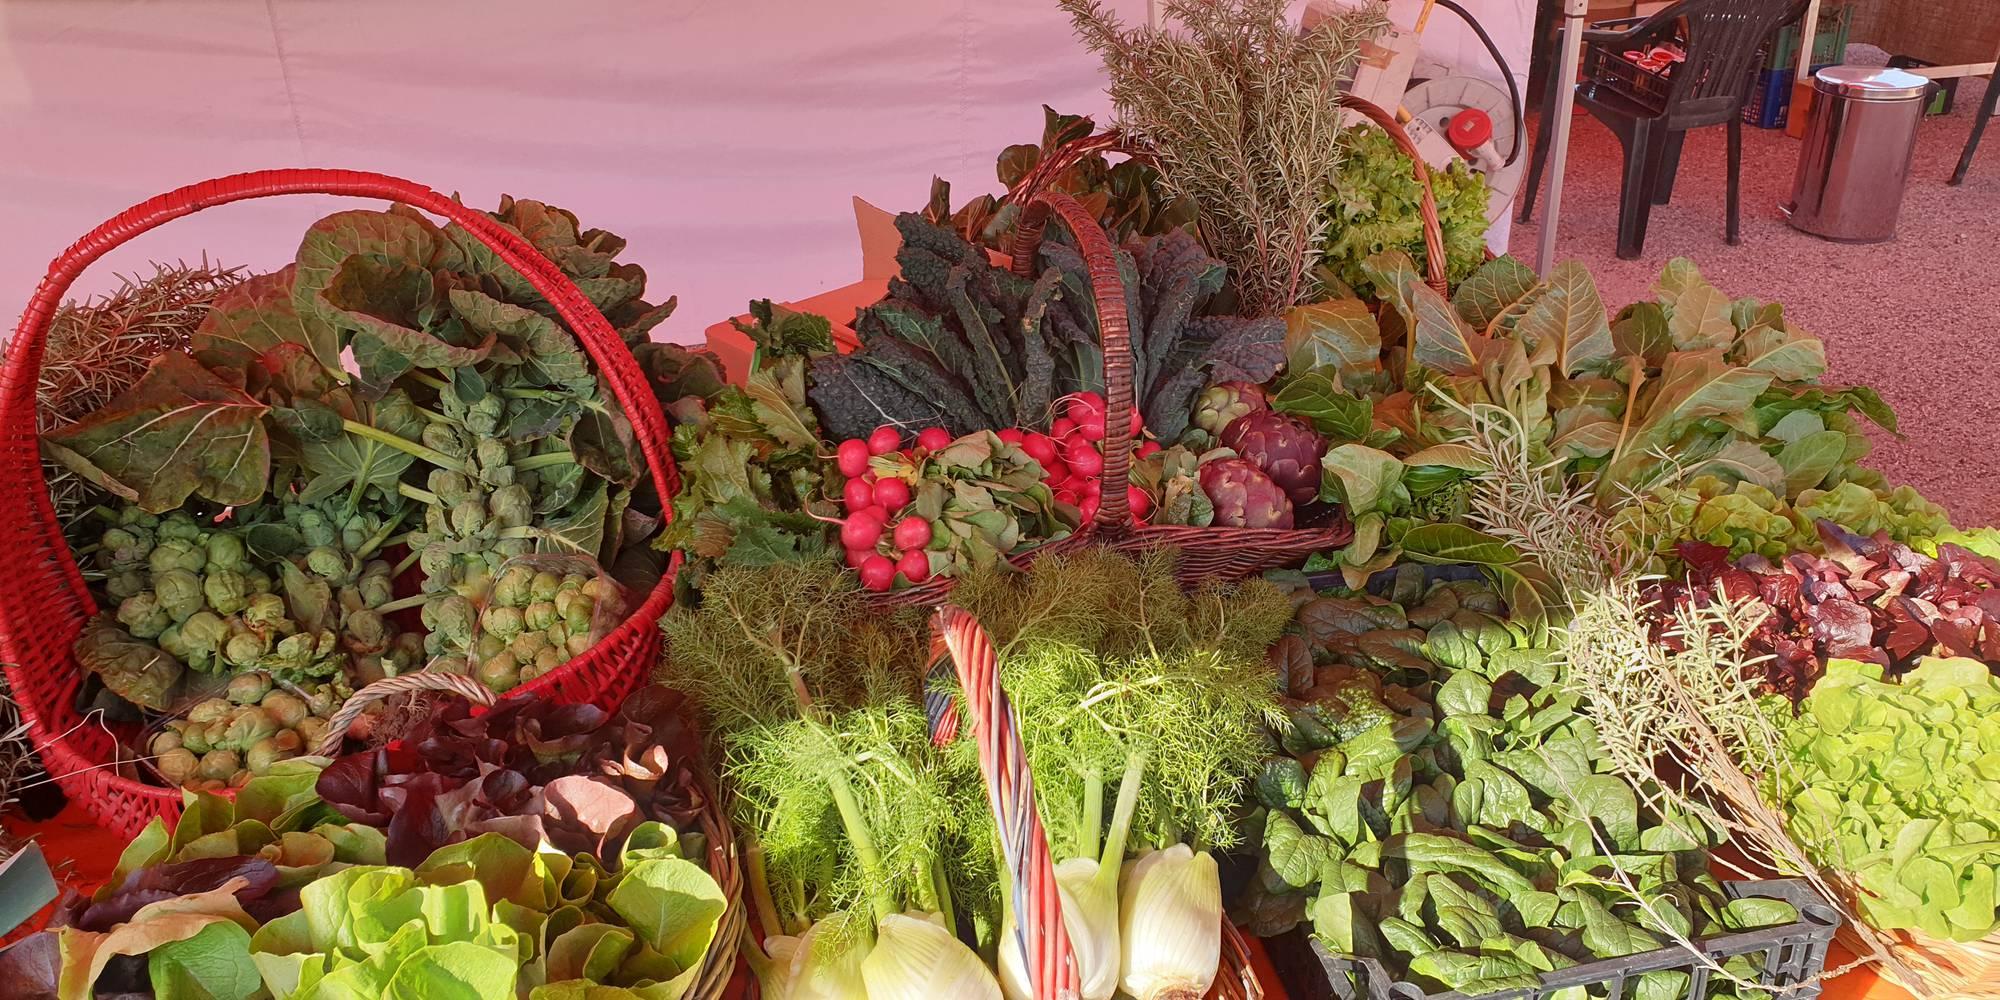 prodotti mercato borgochiesanuova (14).jpg